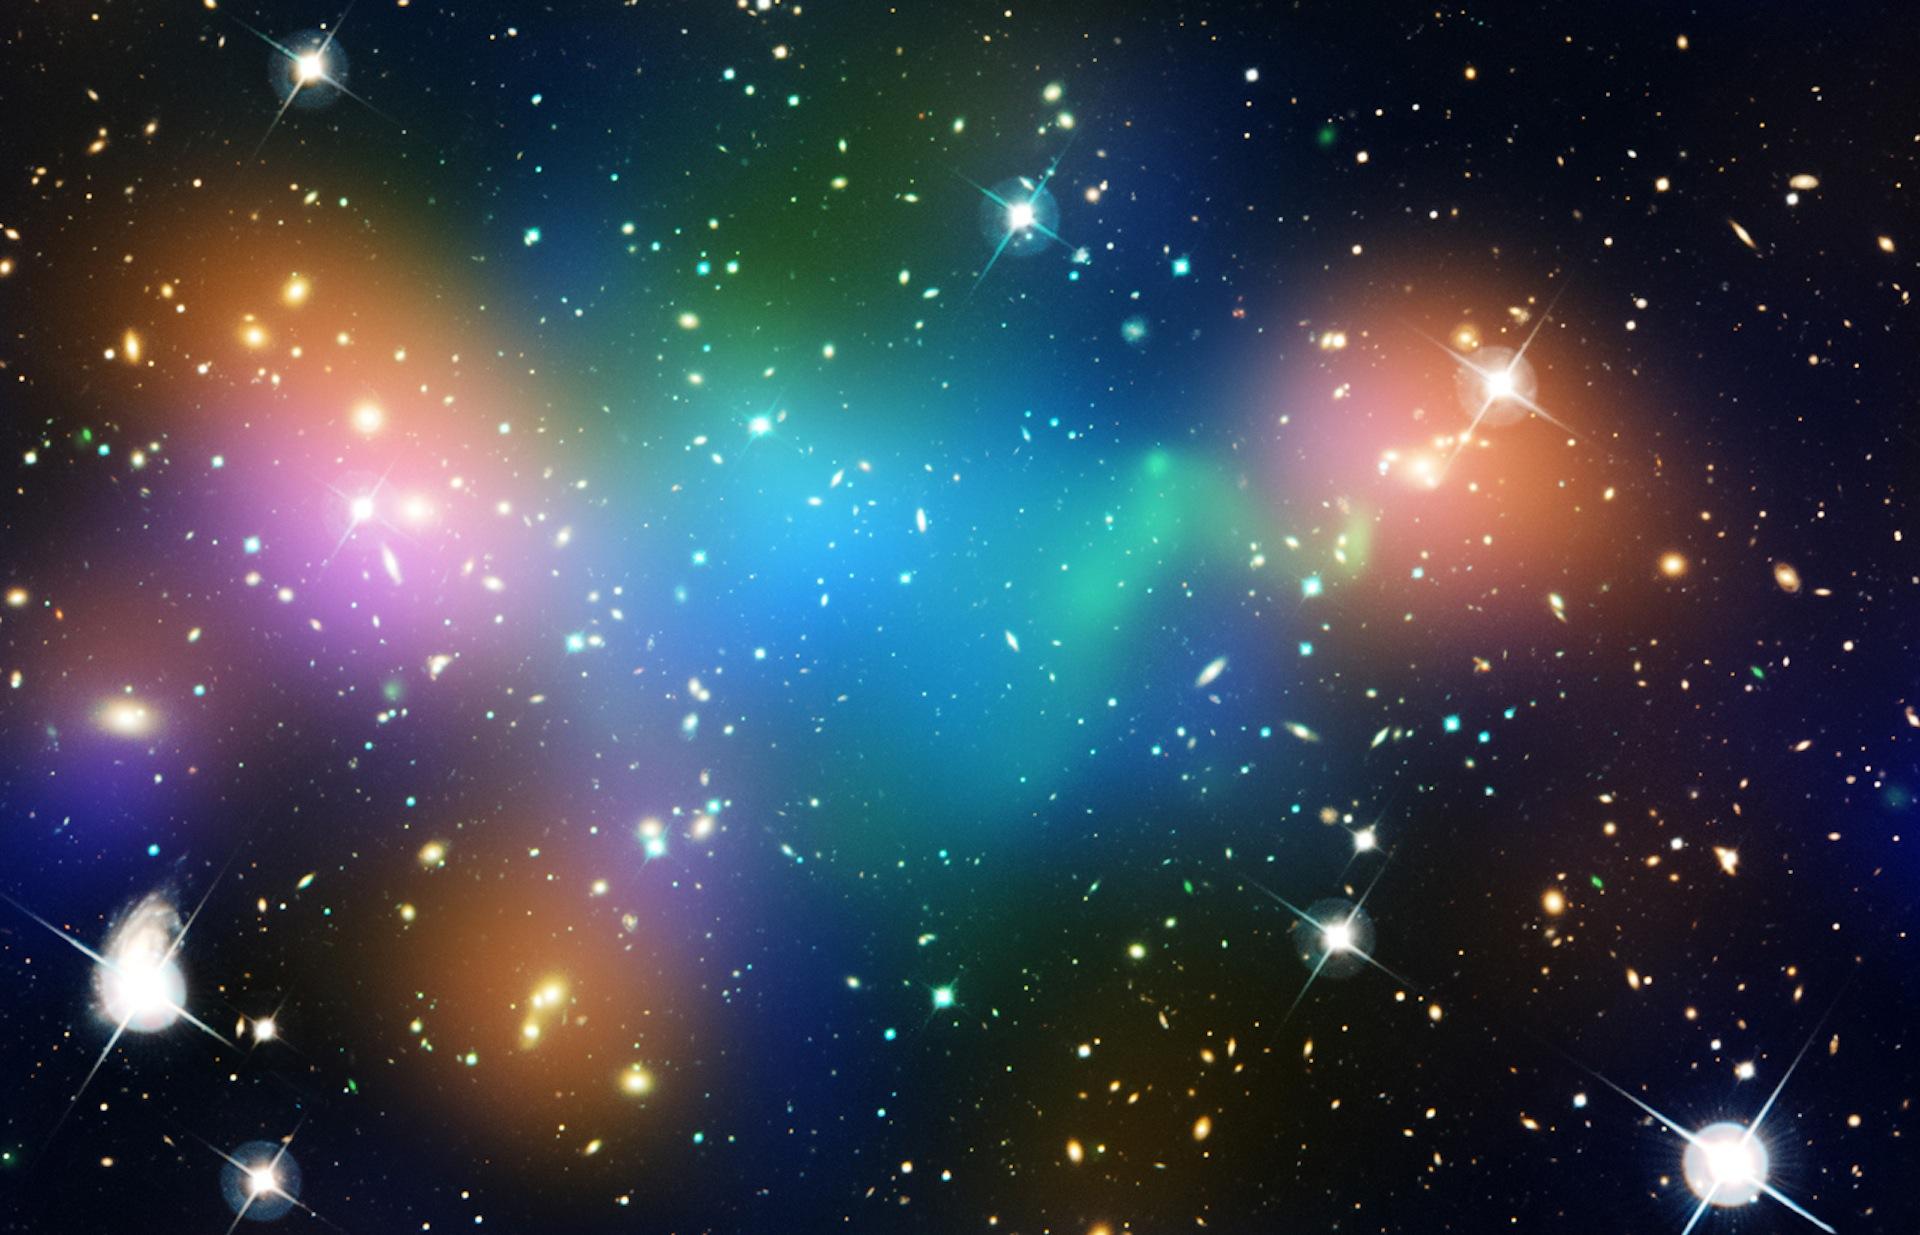 Dark Matter Core Defies Explanation in Hubble Image